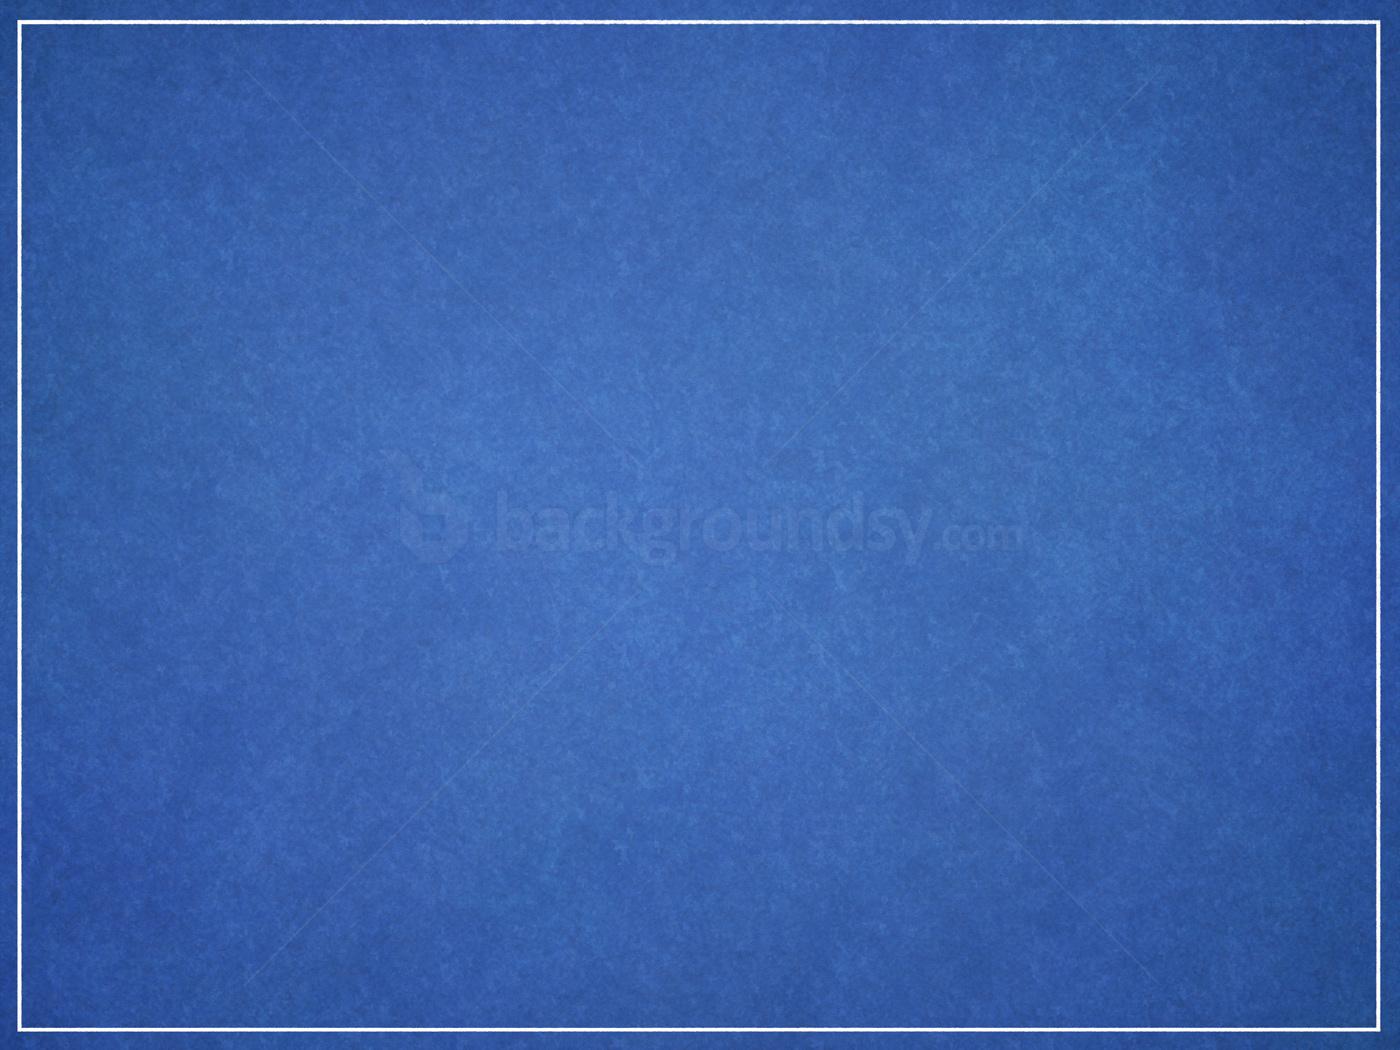 Blueprint Paper Backgroundsy Com